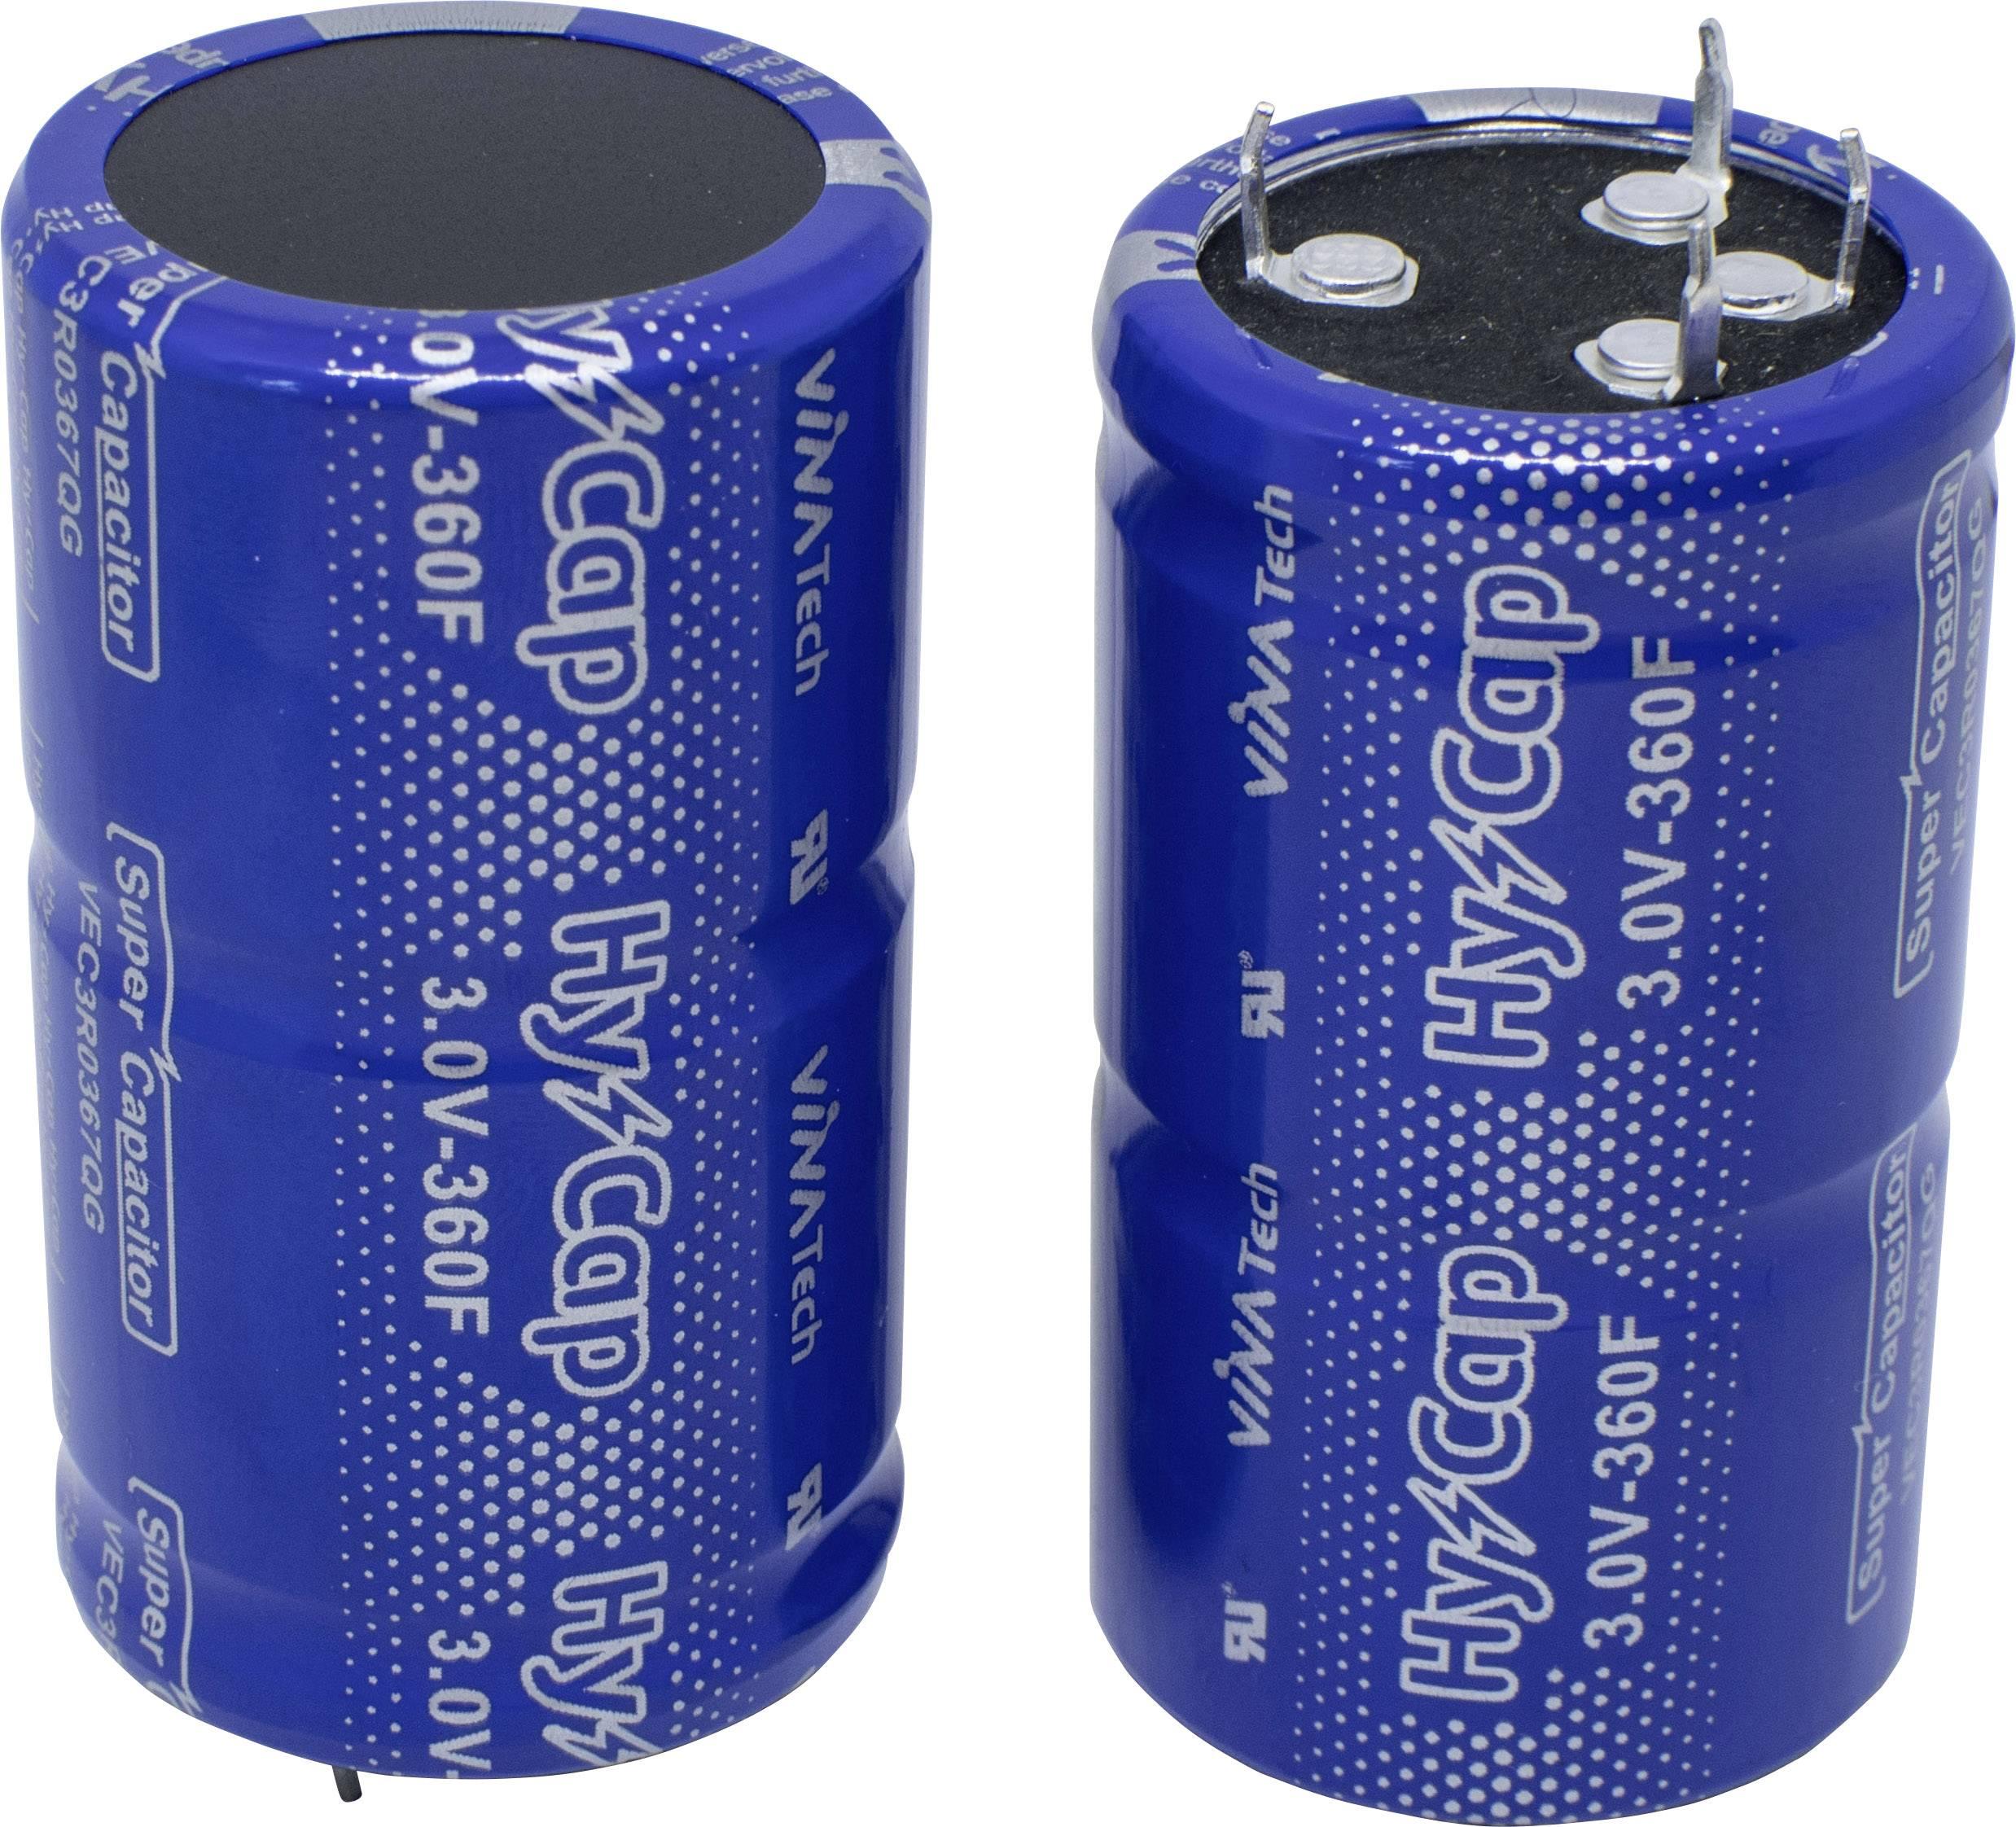 Dvouvrstvý kondenzátor VINATech VEC3R0367QG, 360 F, 3 V, (Ø x d) 35 mm x 62 mm, 1 ks